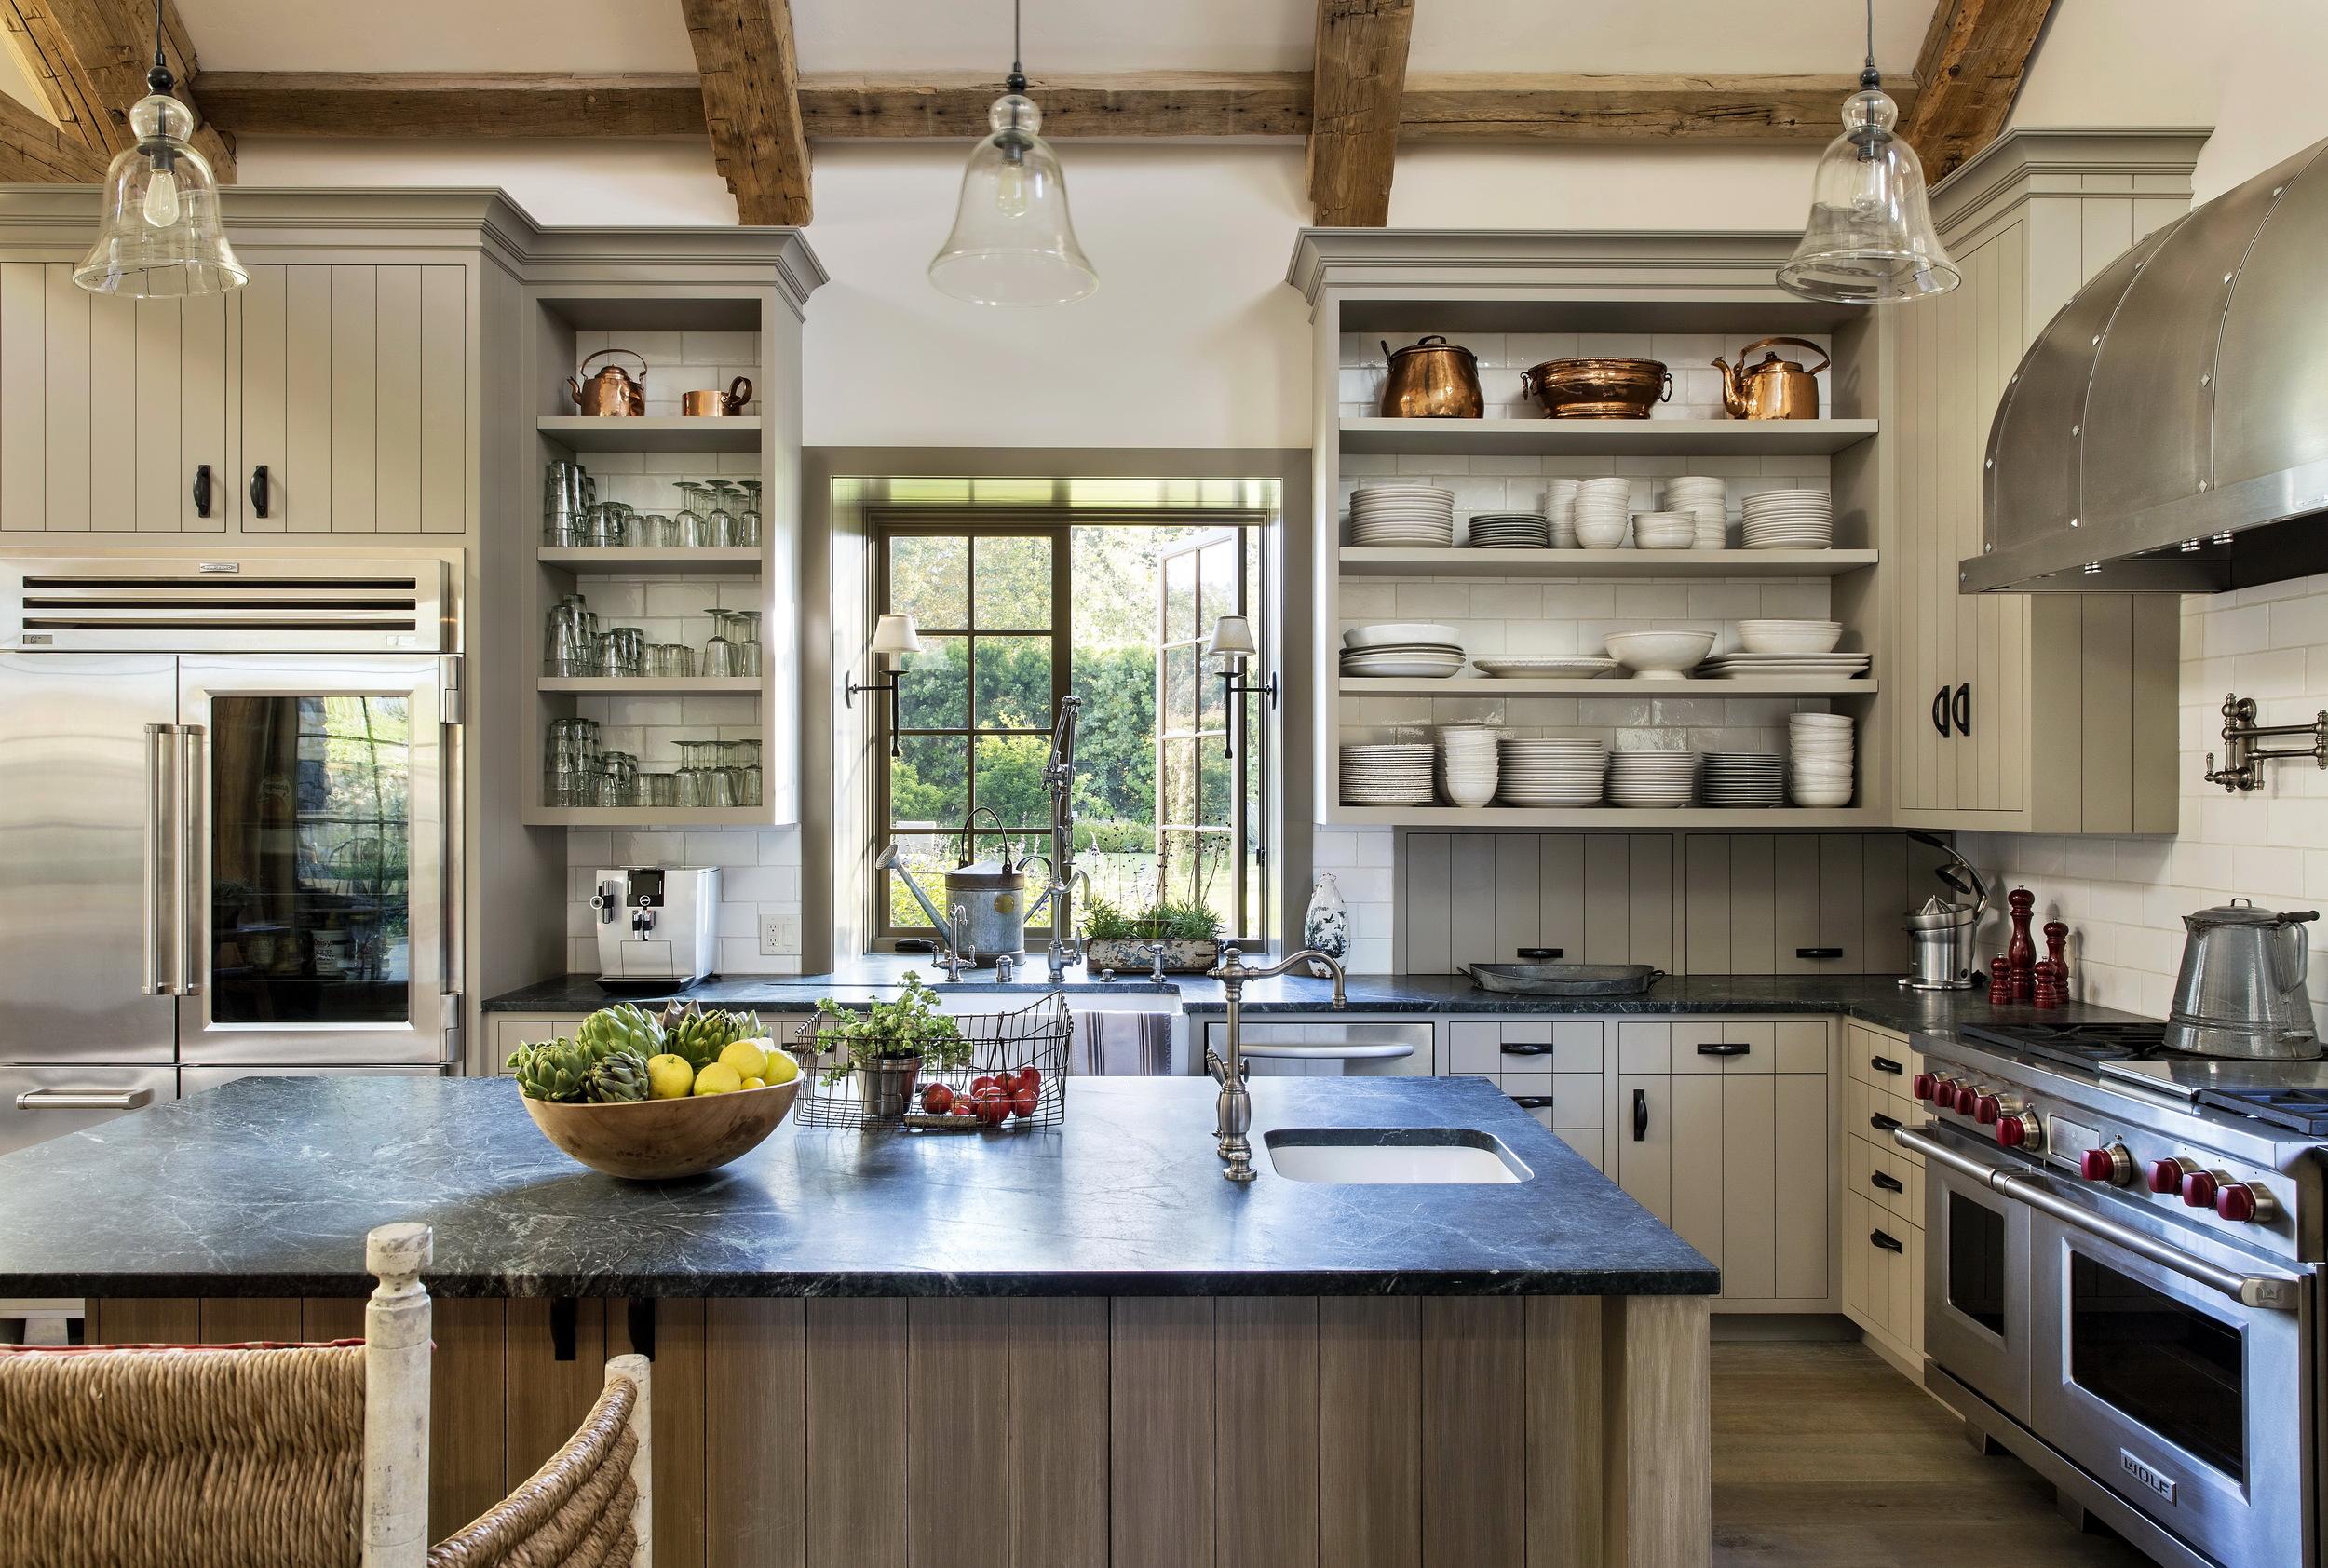 11 Brentwood Pennsylvania Stone Farm House Kitchen.jpg